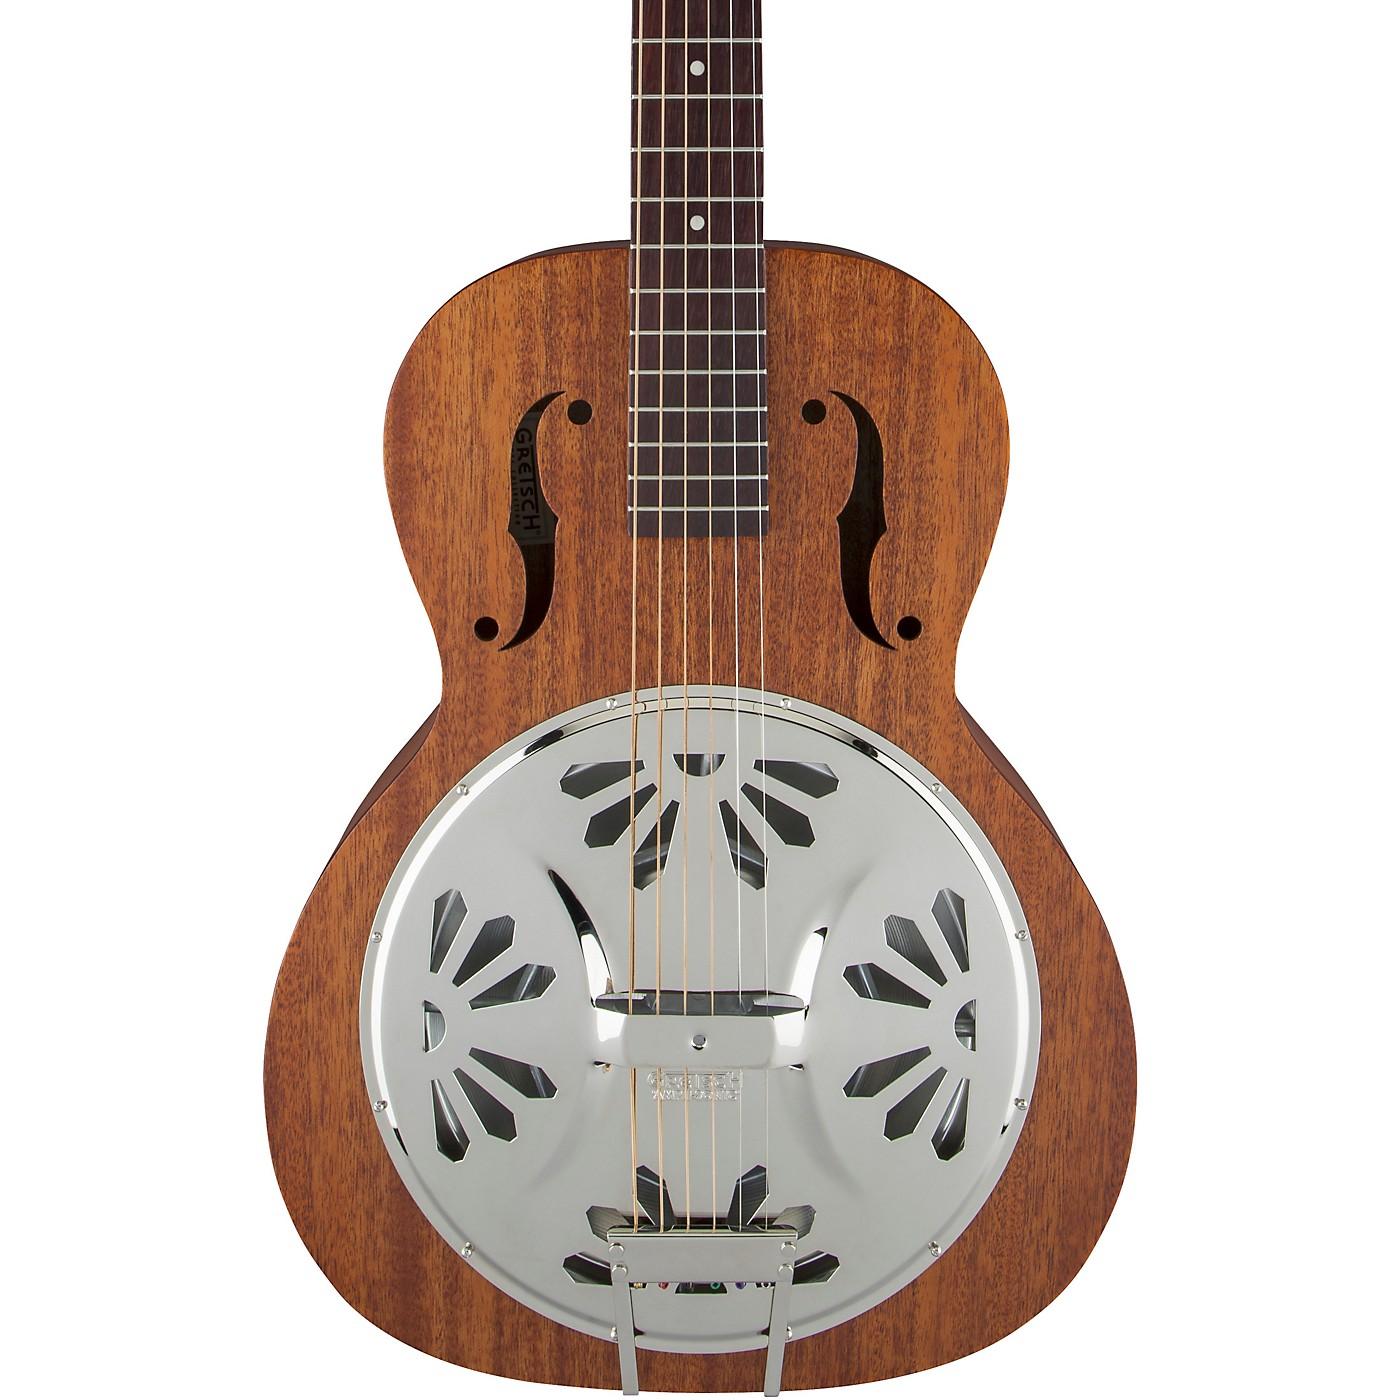 Gretsch Guitars G9200 Boxcar Round-Neck Resonator Guitar thumbnail